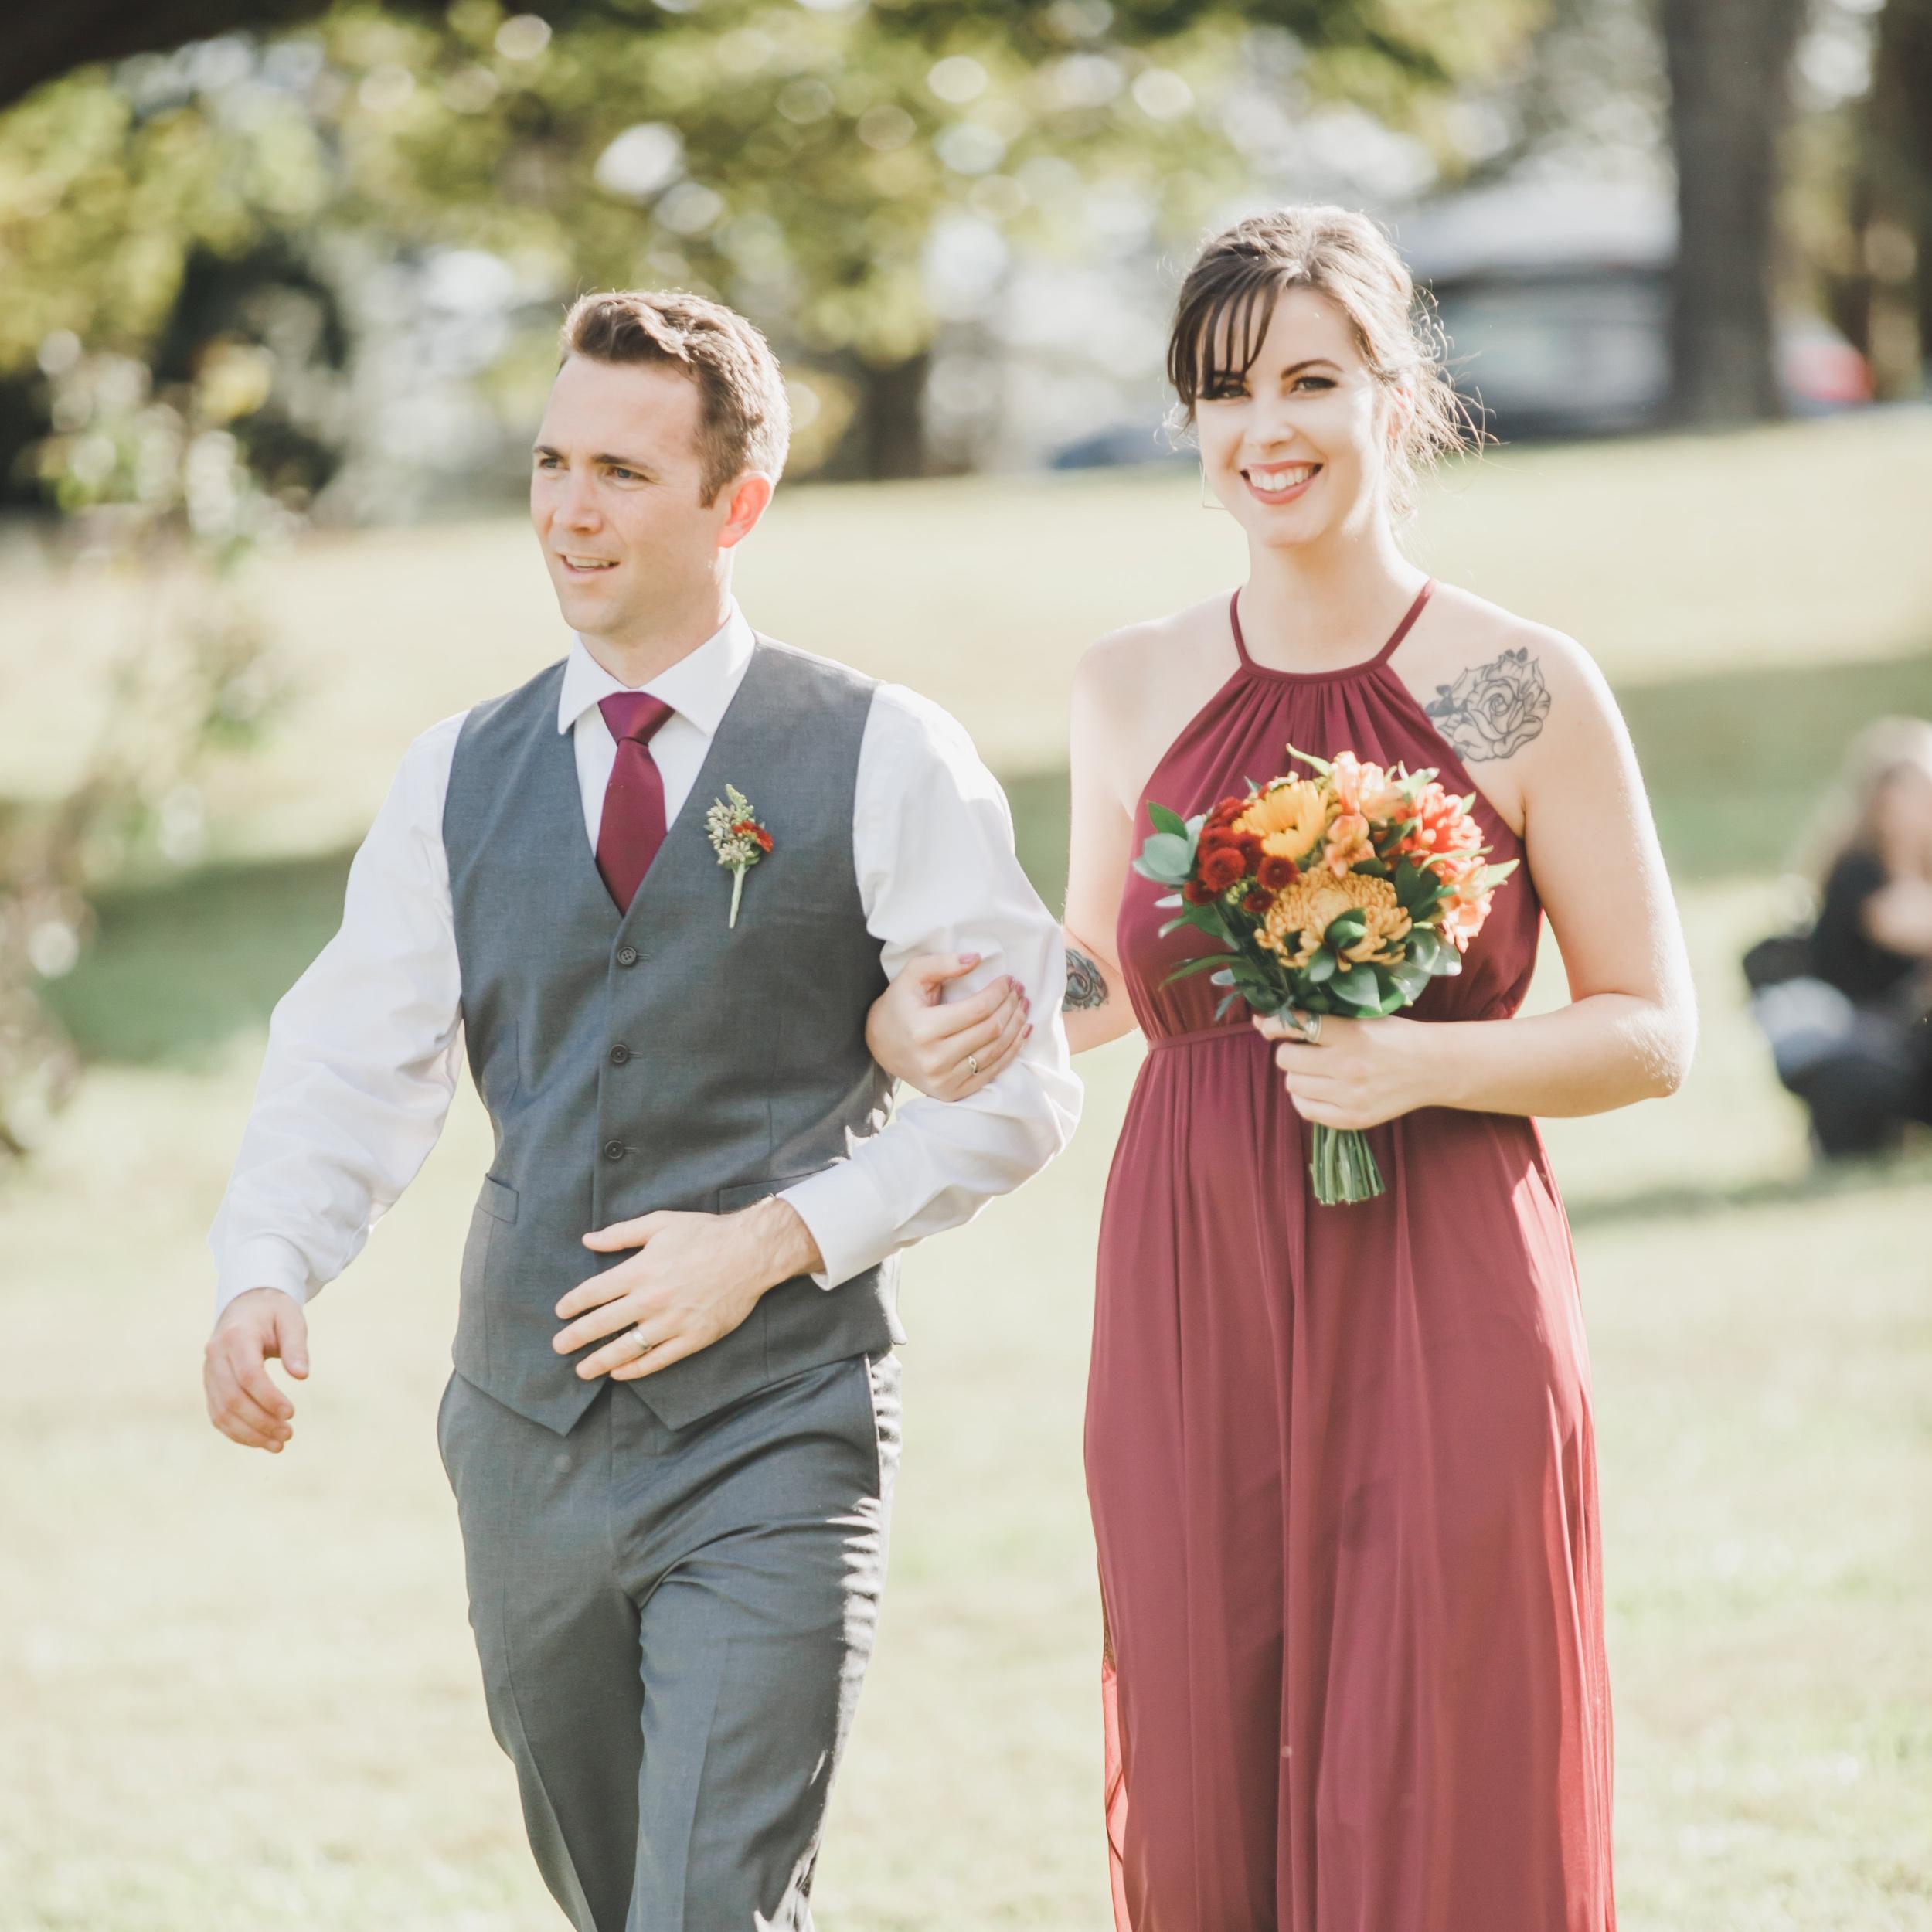 Fling - Virginia Wedding Photographer - Photography by Amy Nicole-329.jpg